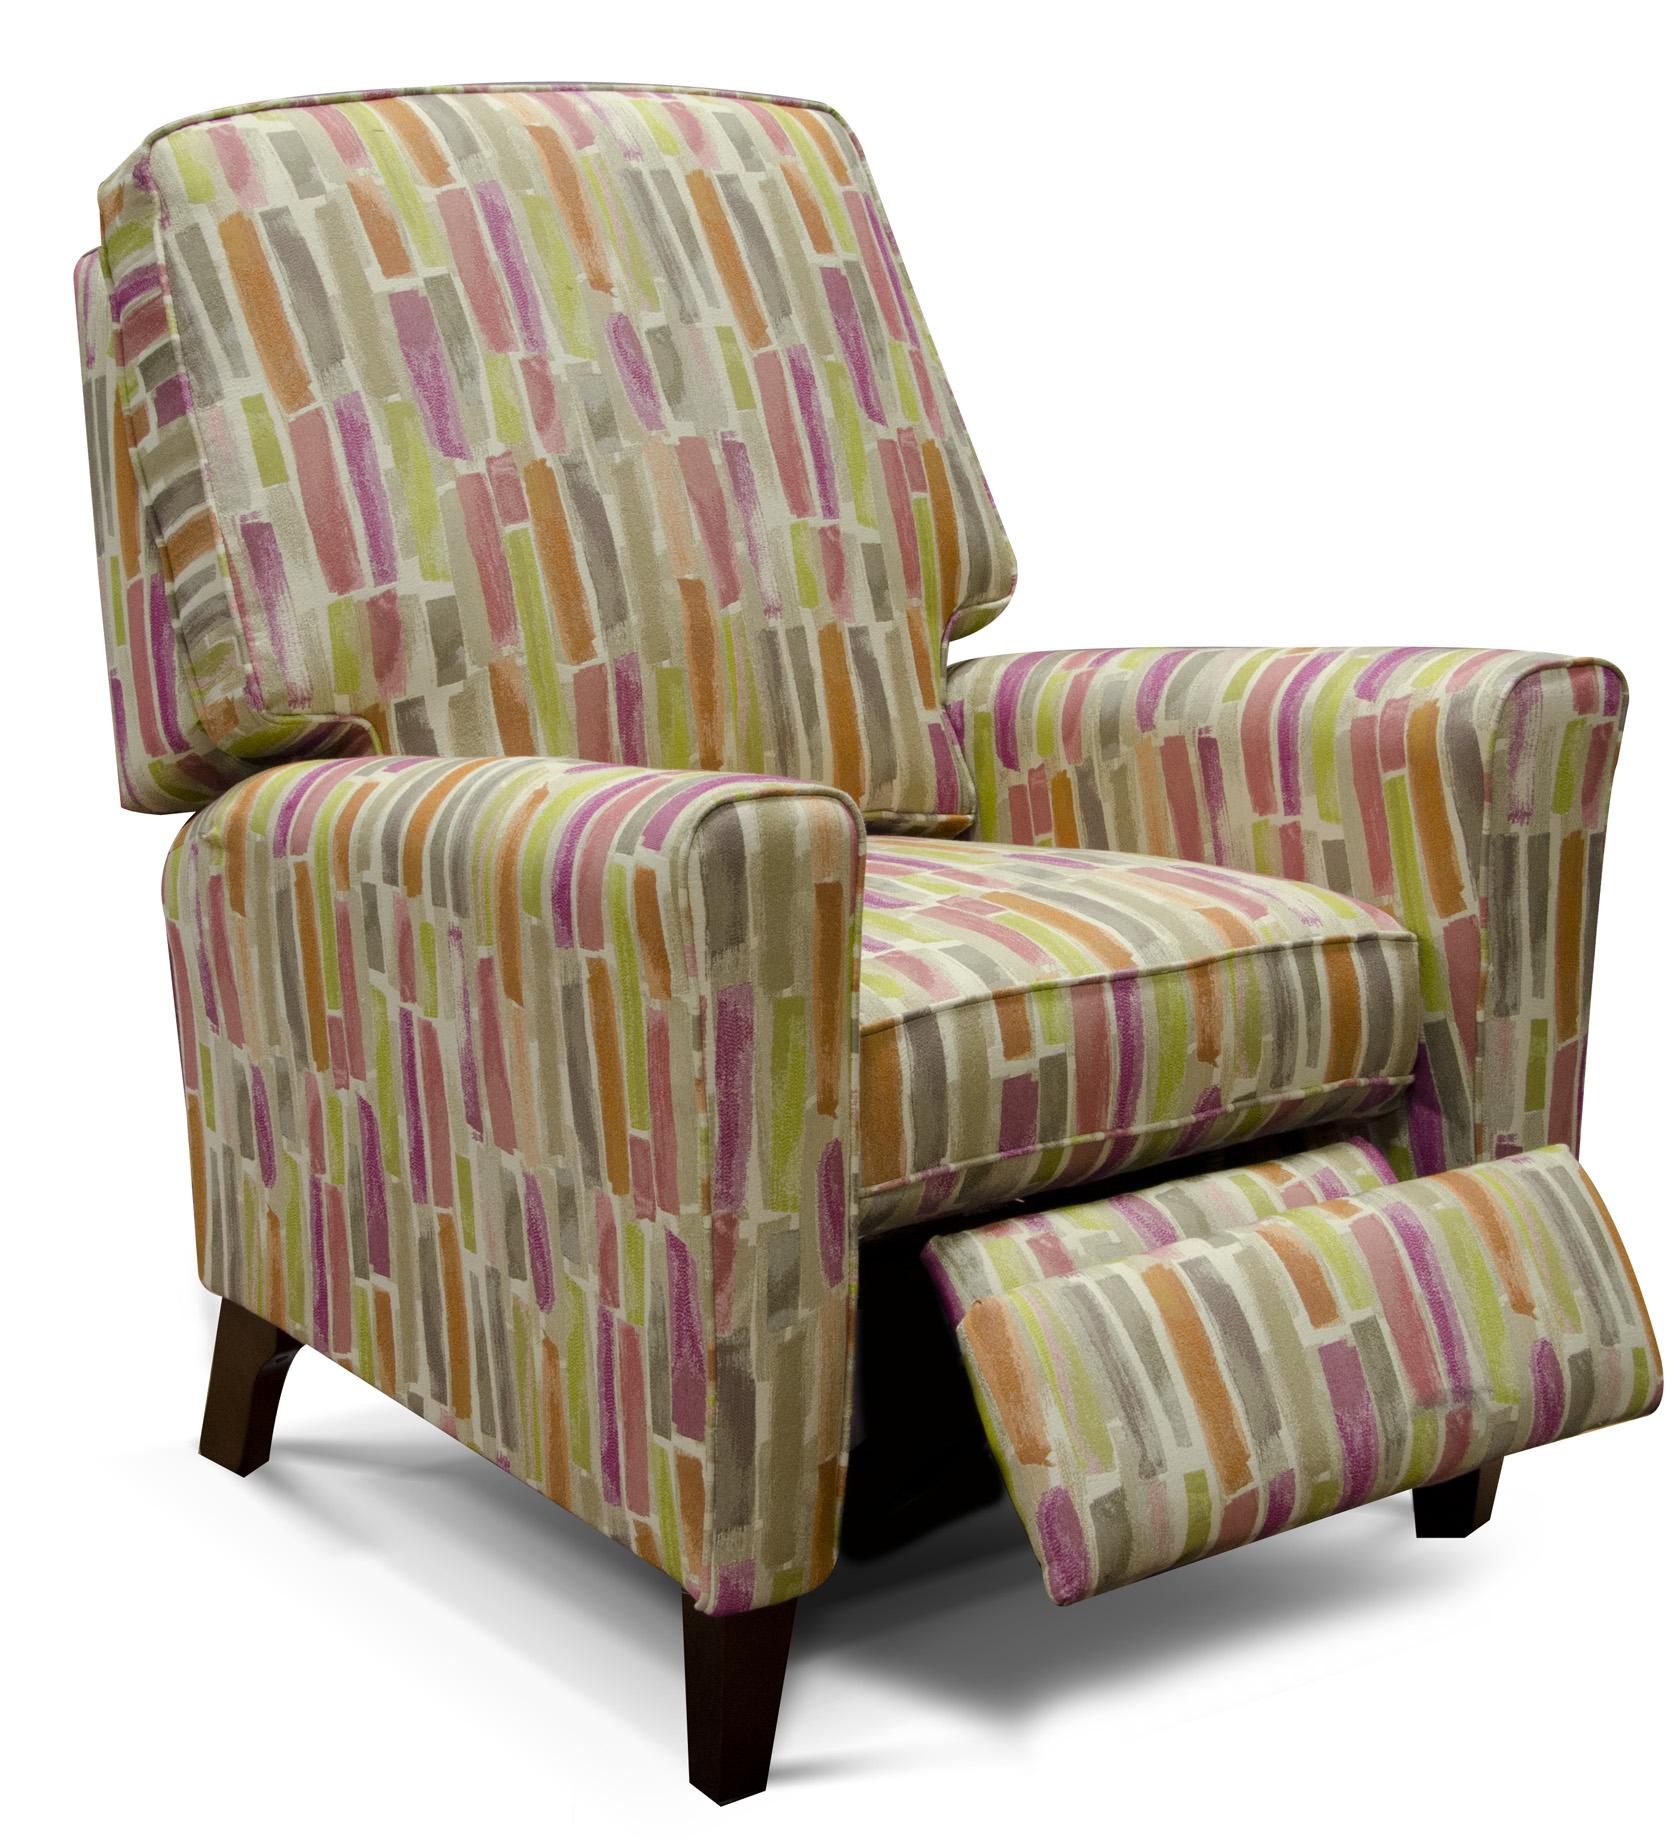 england 6200-31 Reclining Chair